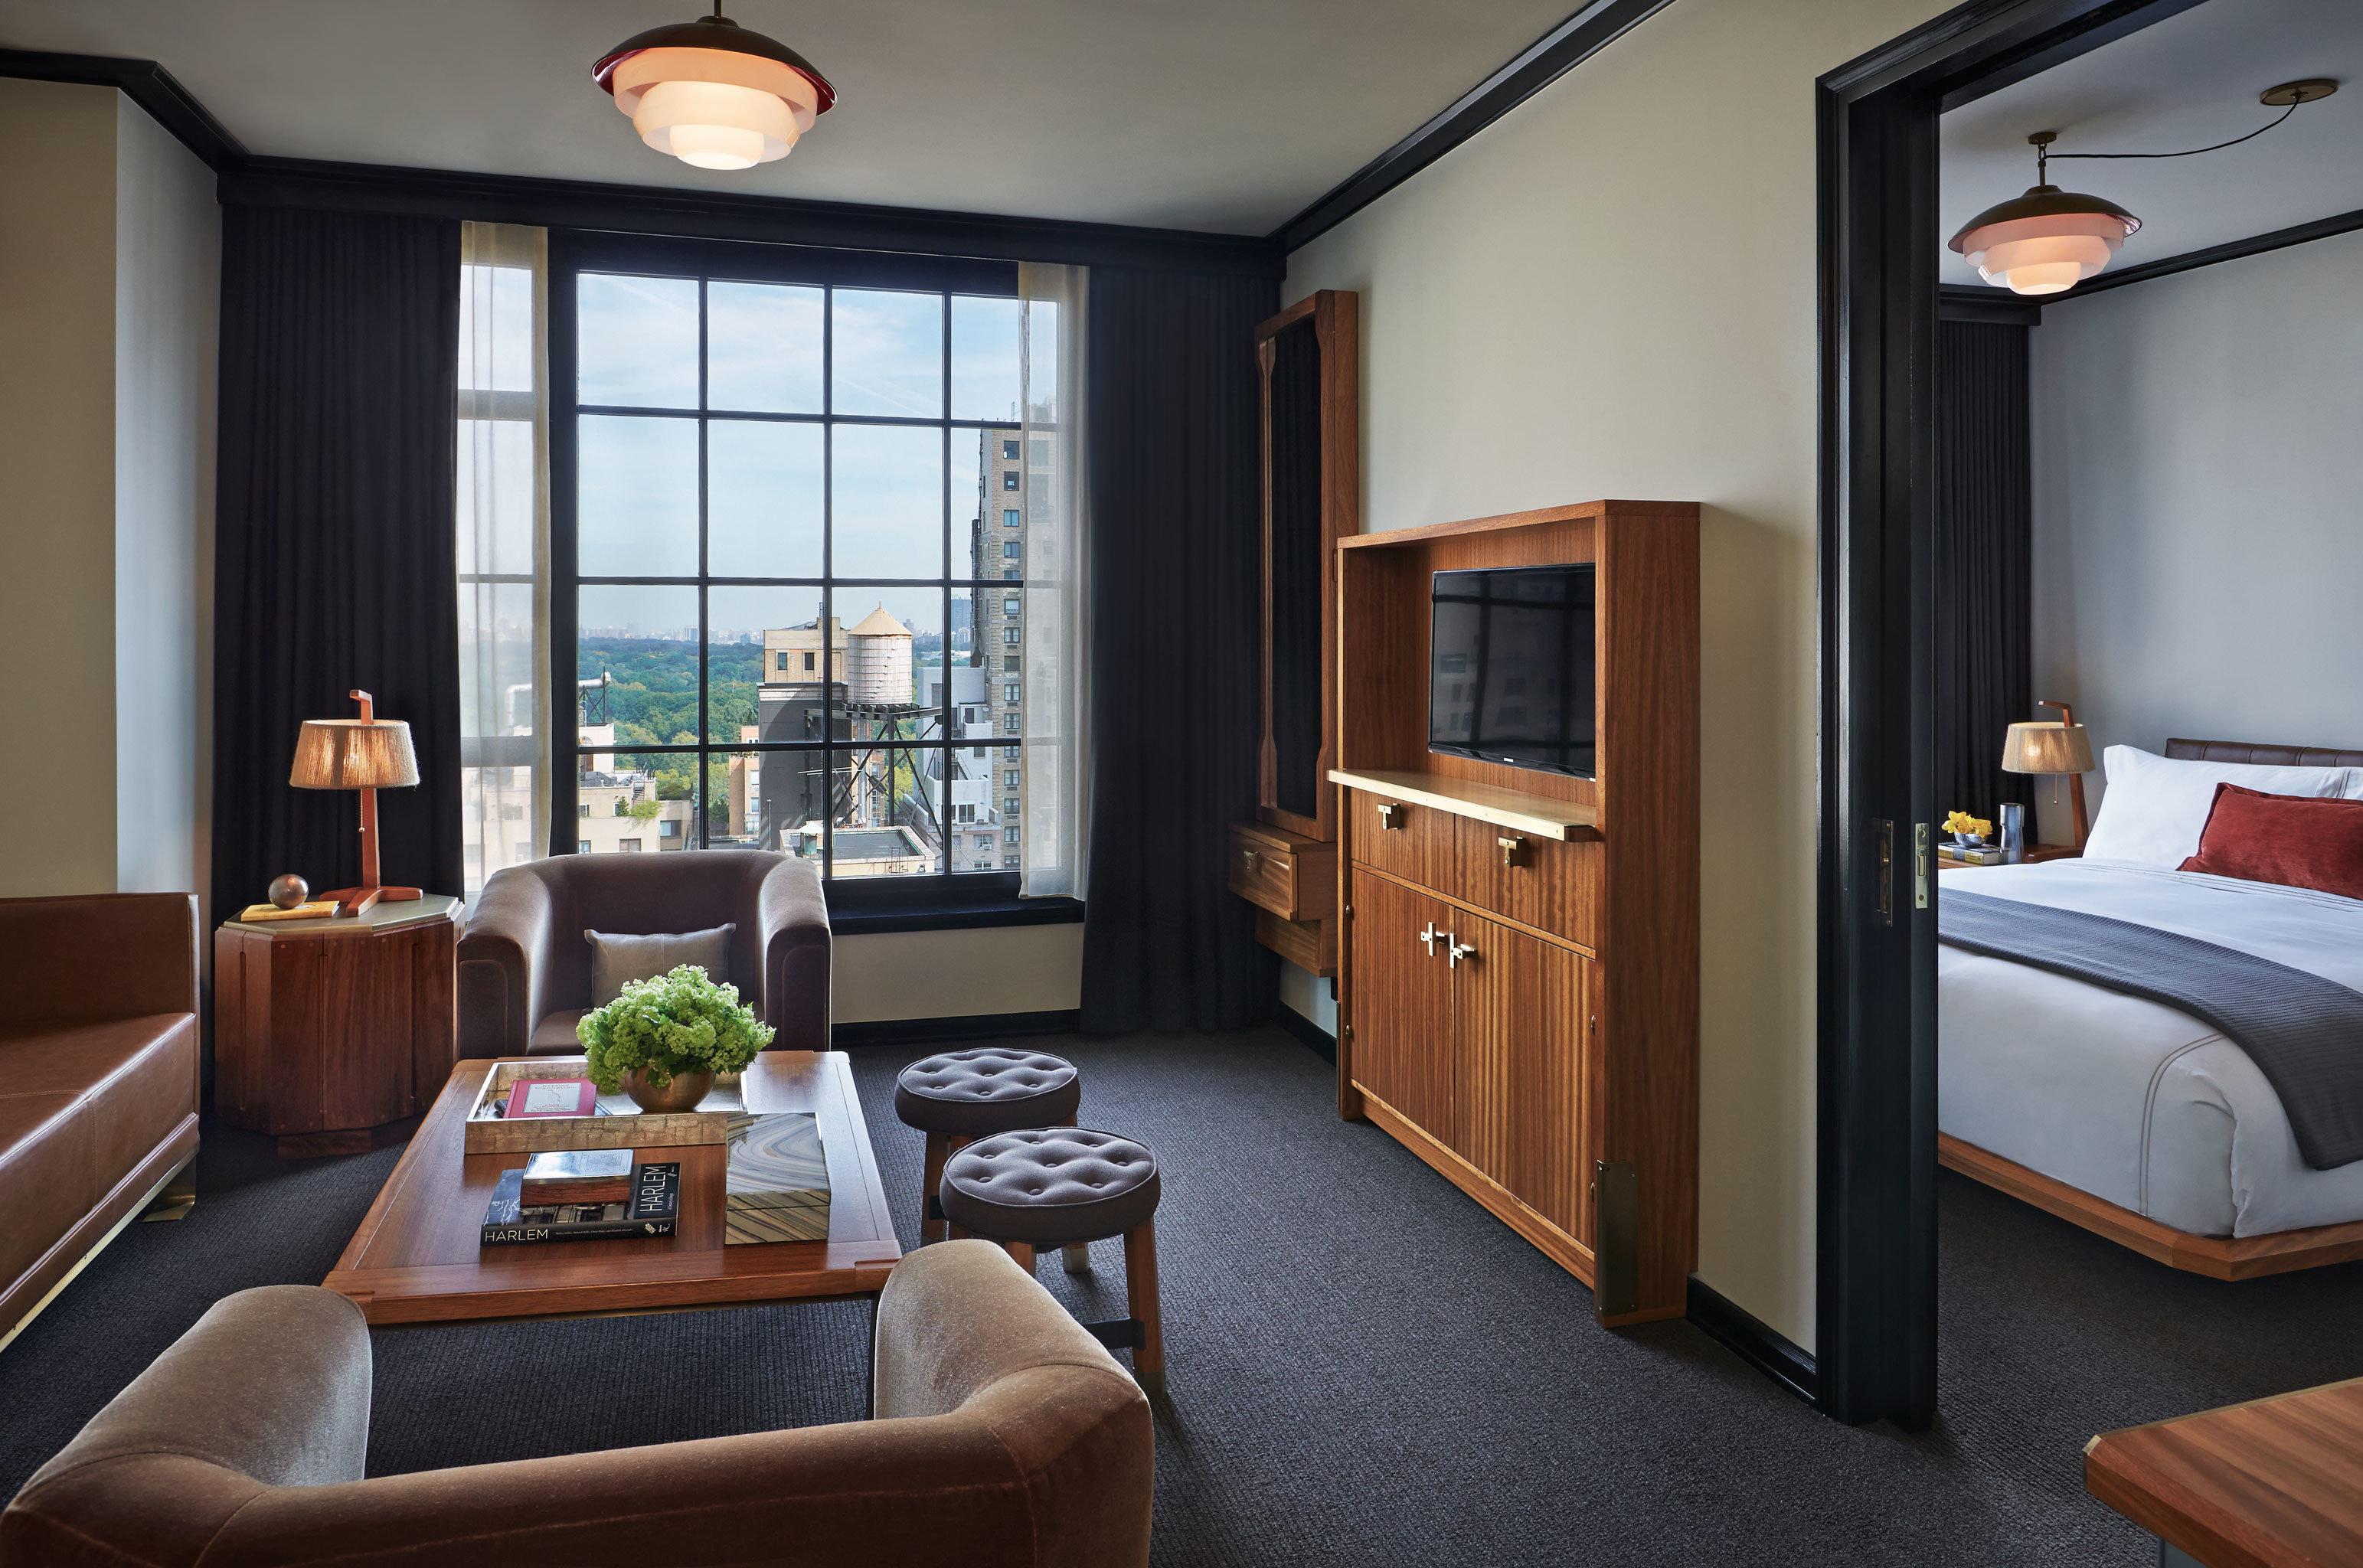 Bedroom City Hotels Luxury Modern Trip Ideas property living room home Suite cottage condominium flat